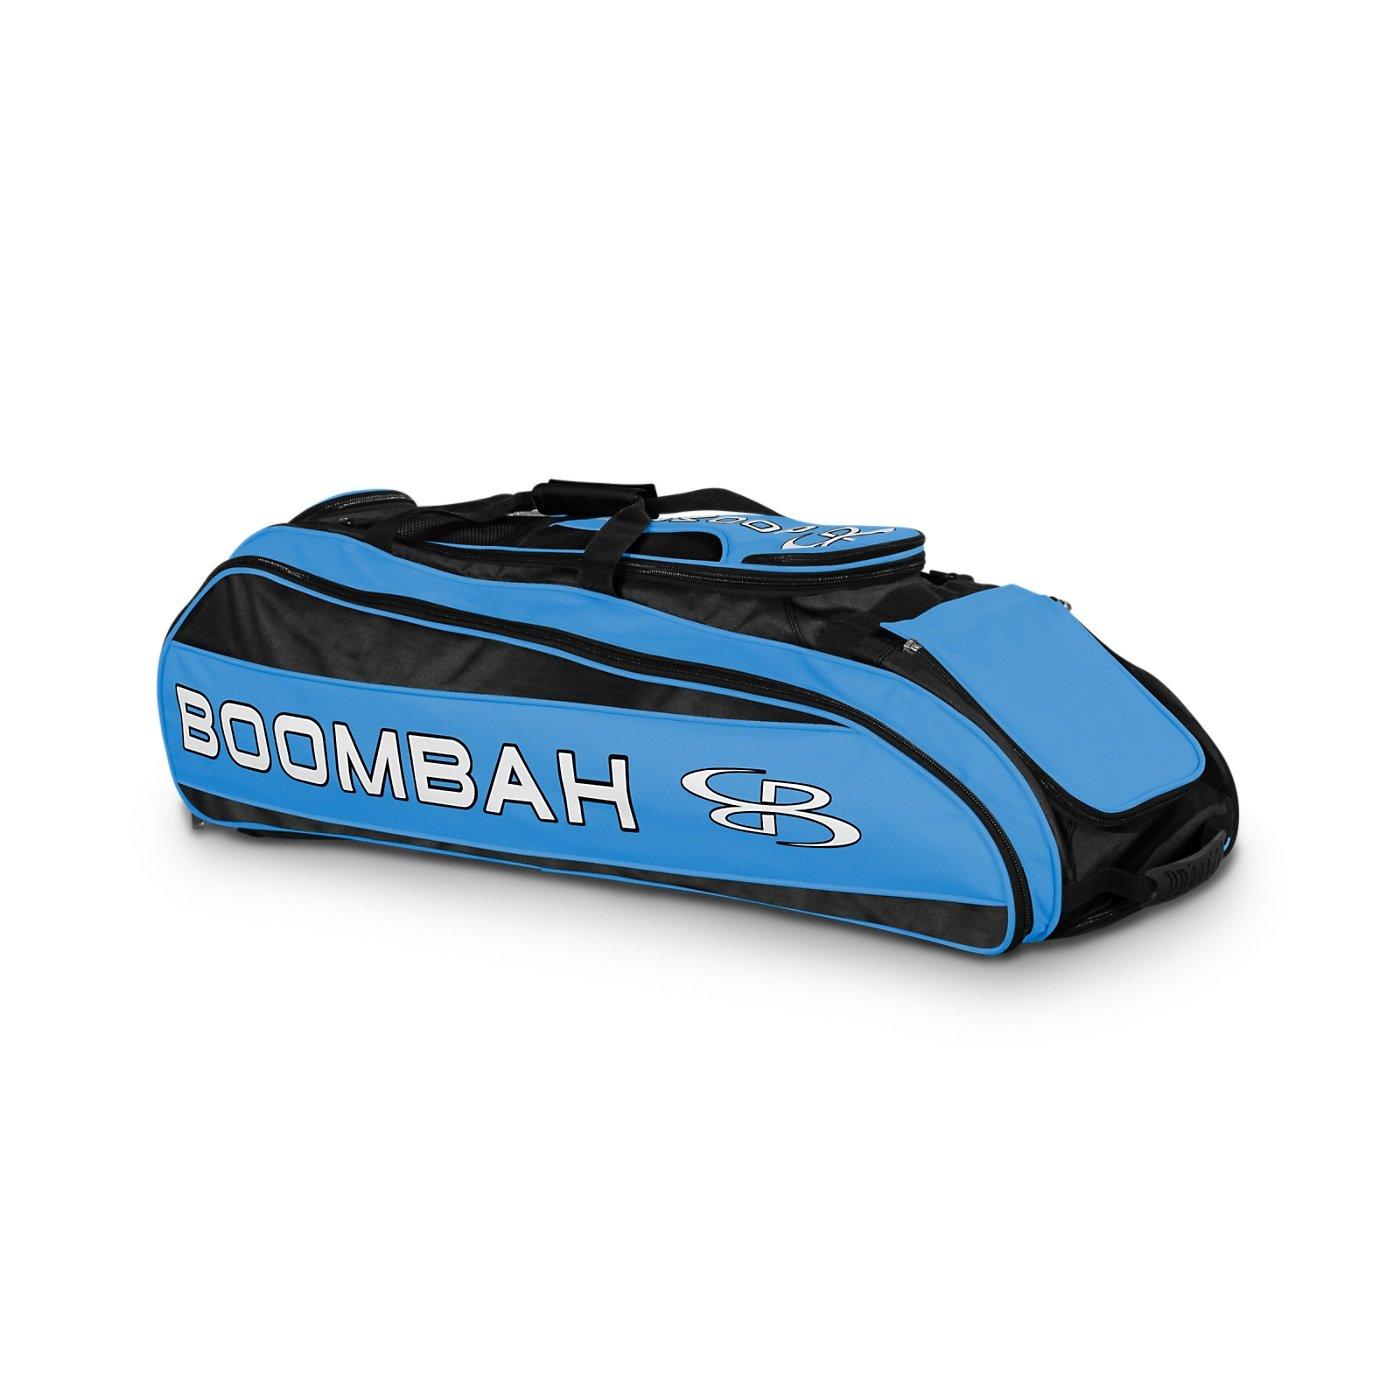 Boombah Beast Baseball/Softball Bat Bag - 40'' x 14'' x 13'' - Black/Columbia Blue - Holds 8 Bats, Glove & Shoe Compartments by Boombah (Image #1)